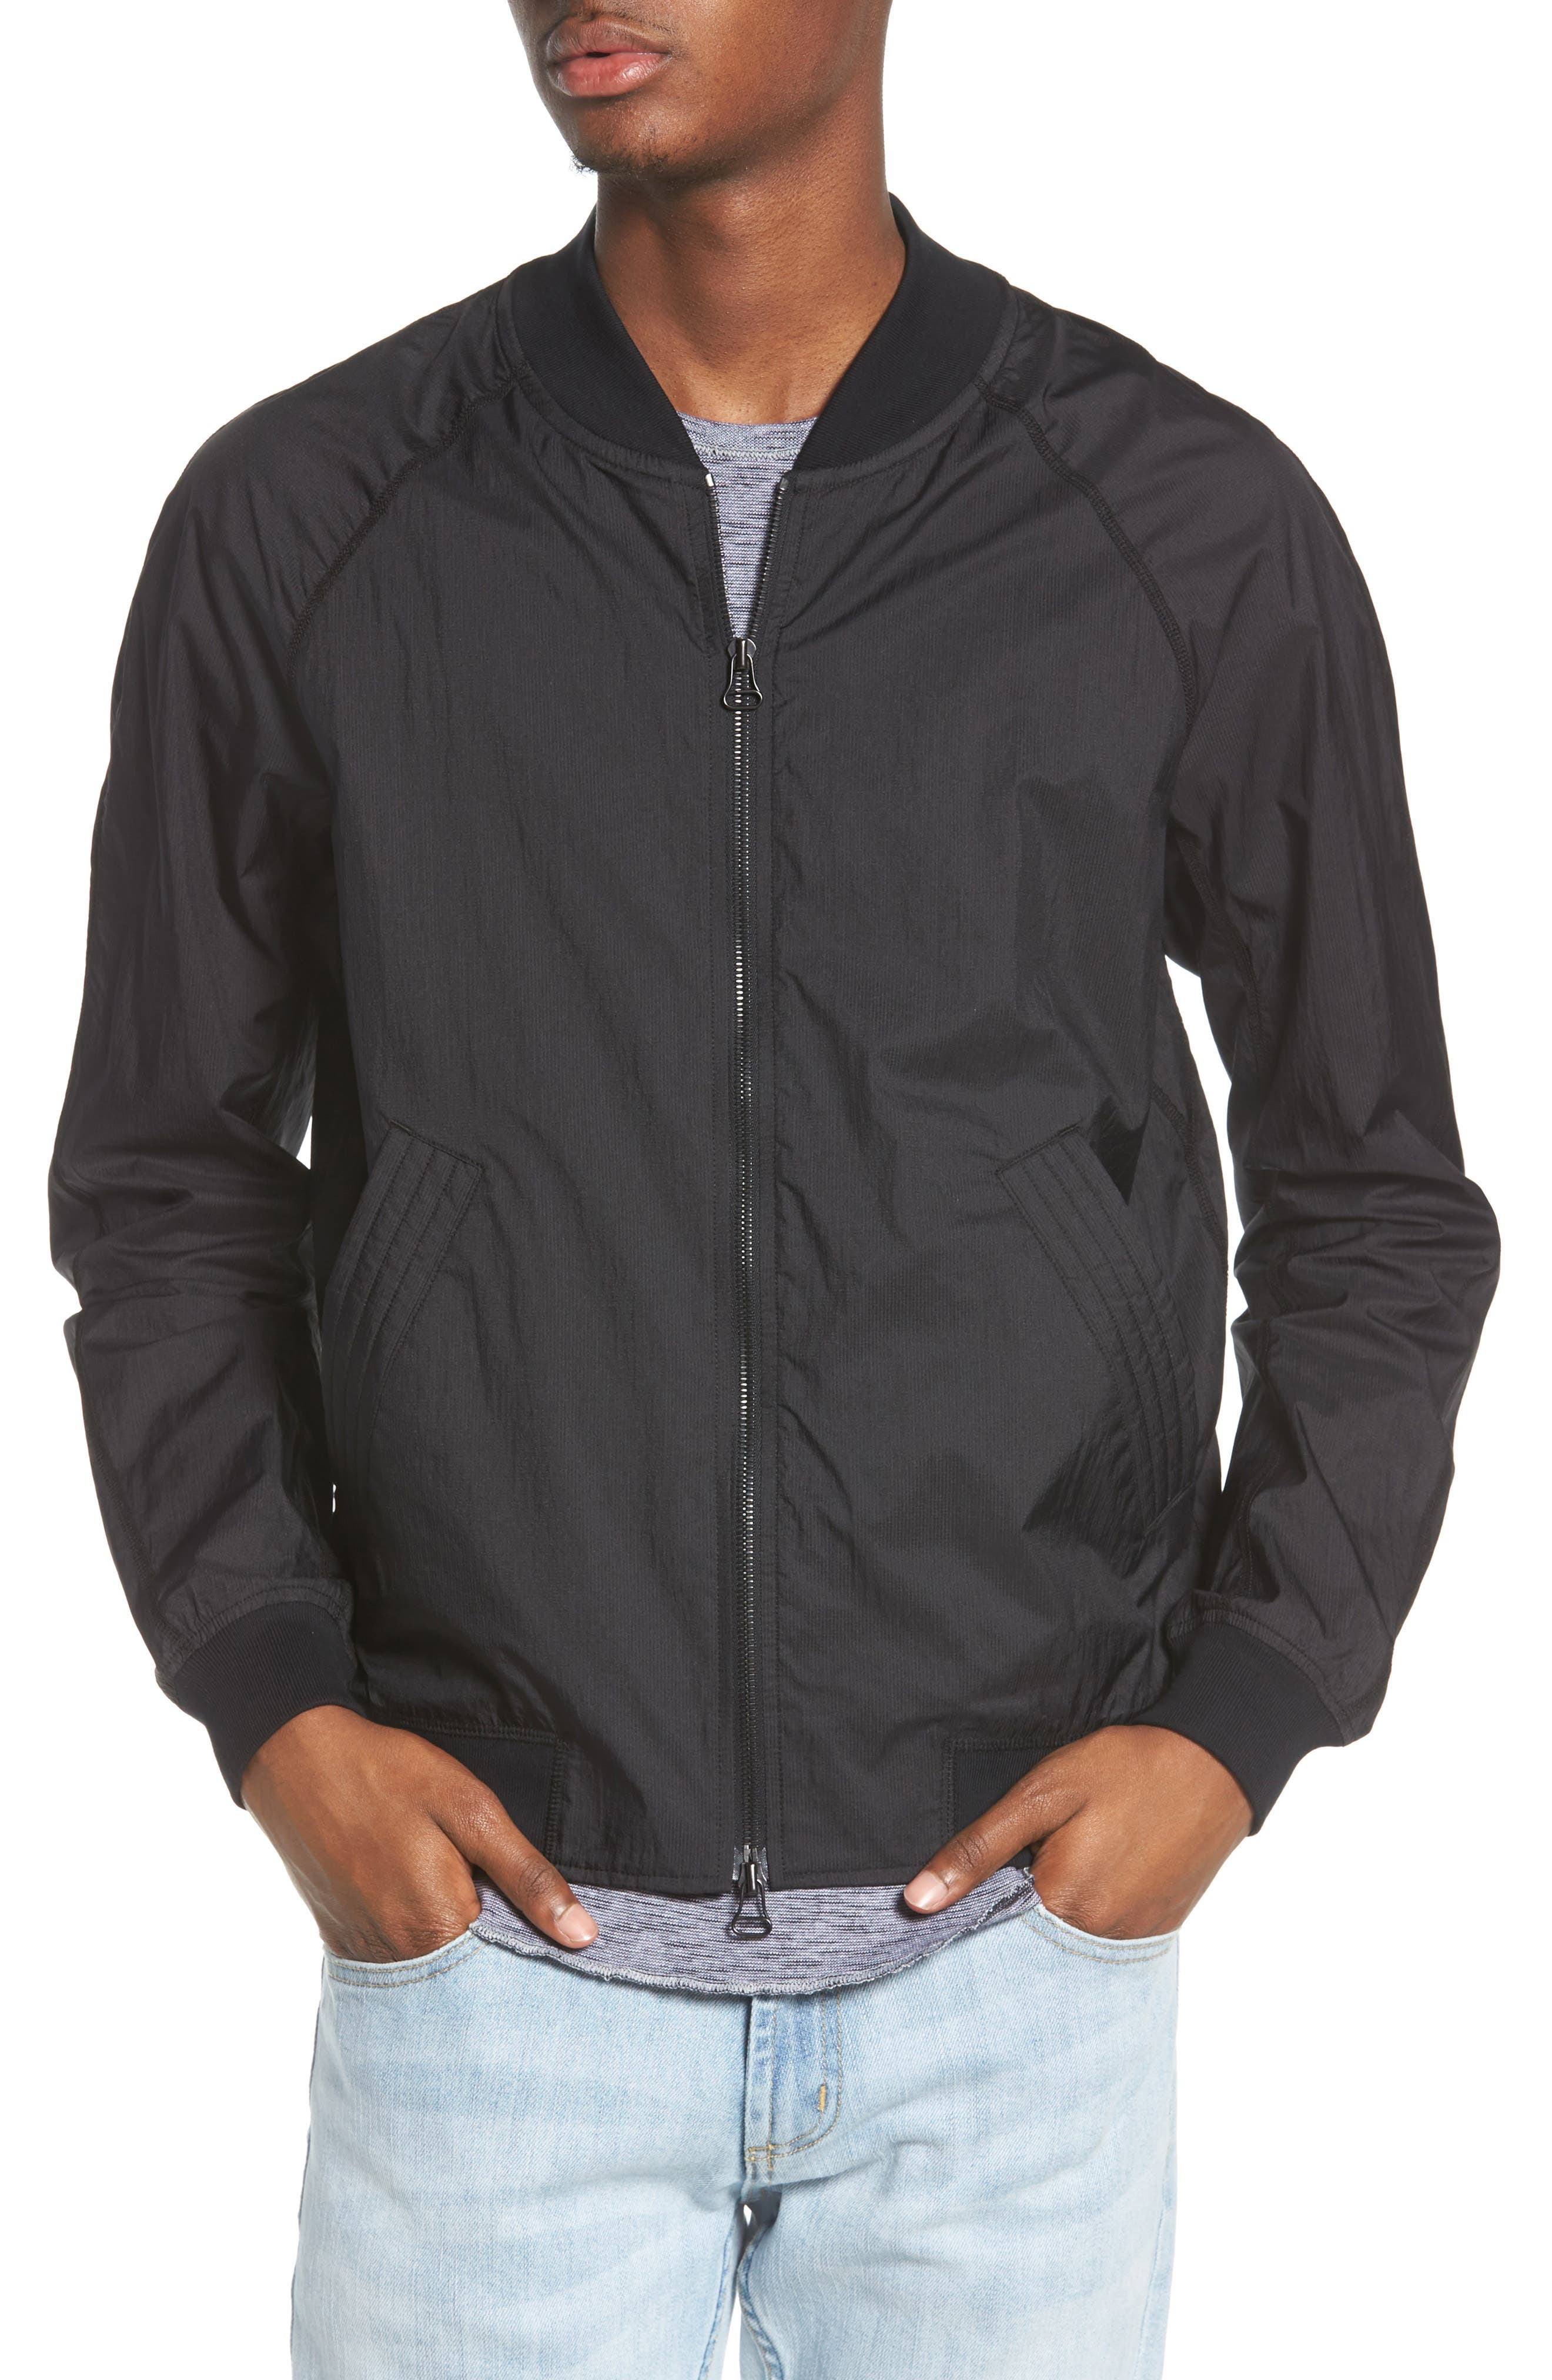 Souvenir Jacket,                             Alternate thumbnail 4, color,                             Black